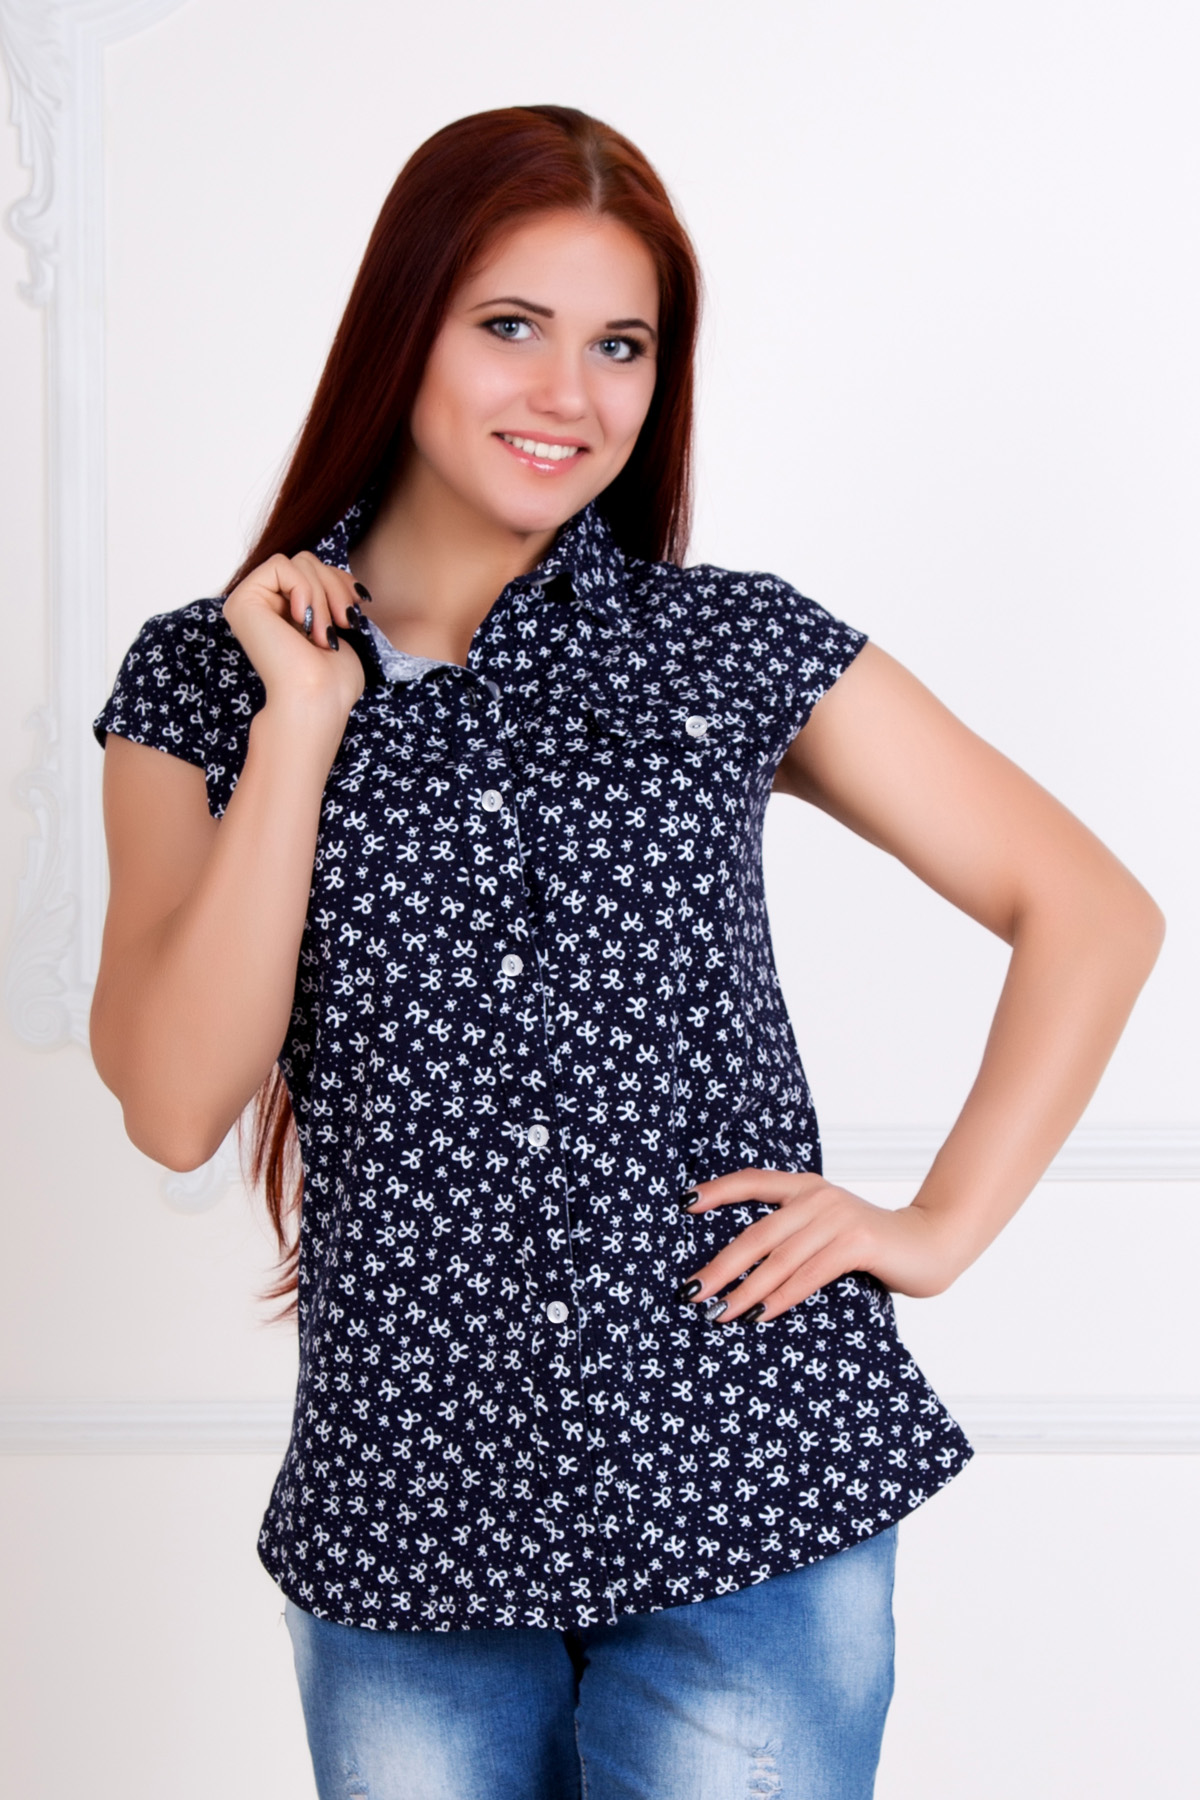 Жен. рубашка  Летняя  р. 64 - Женская одежда артикул: 18556